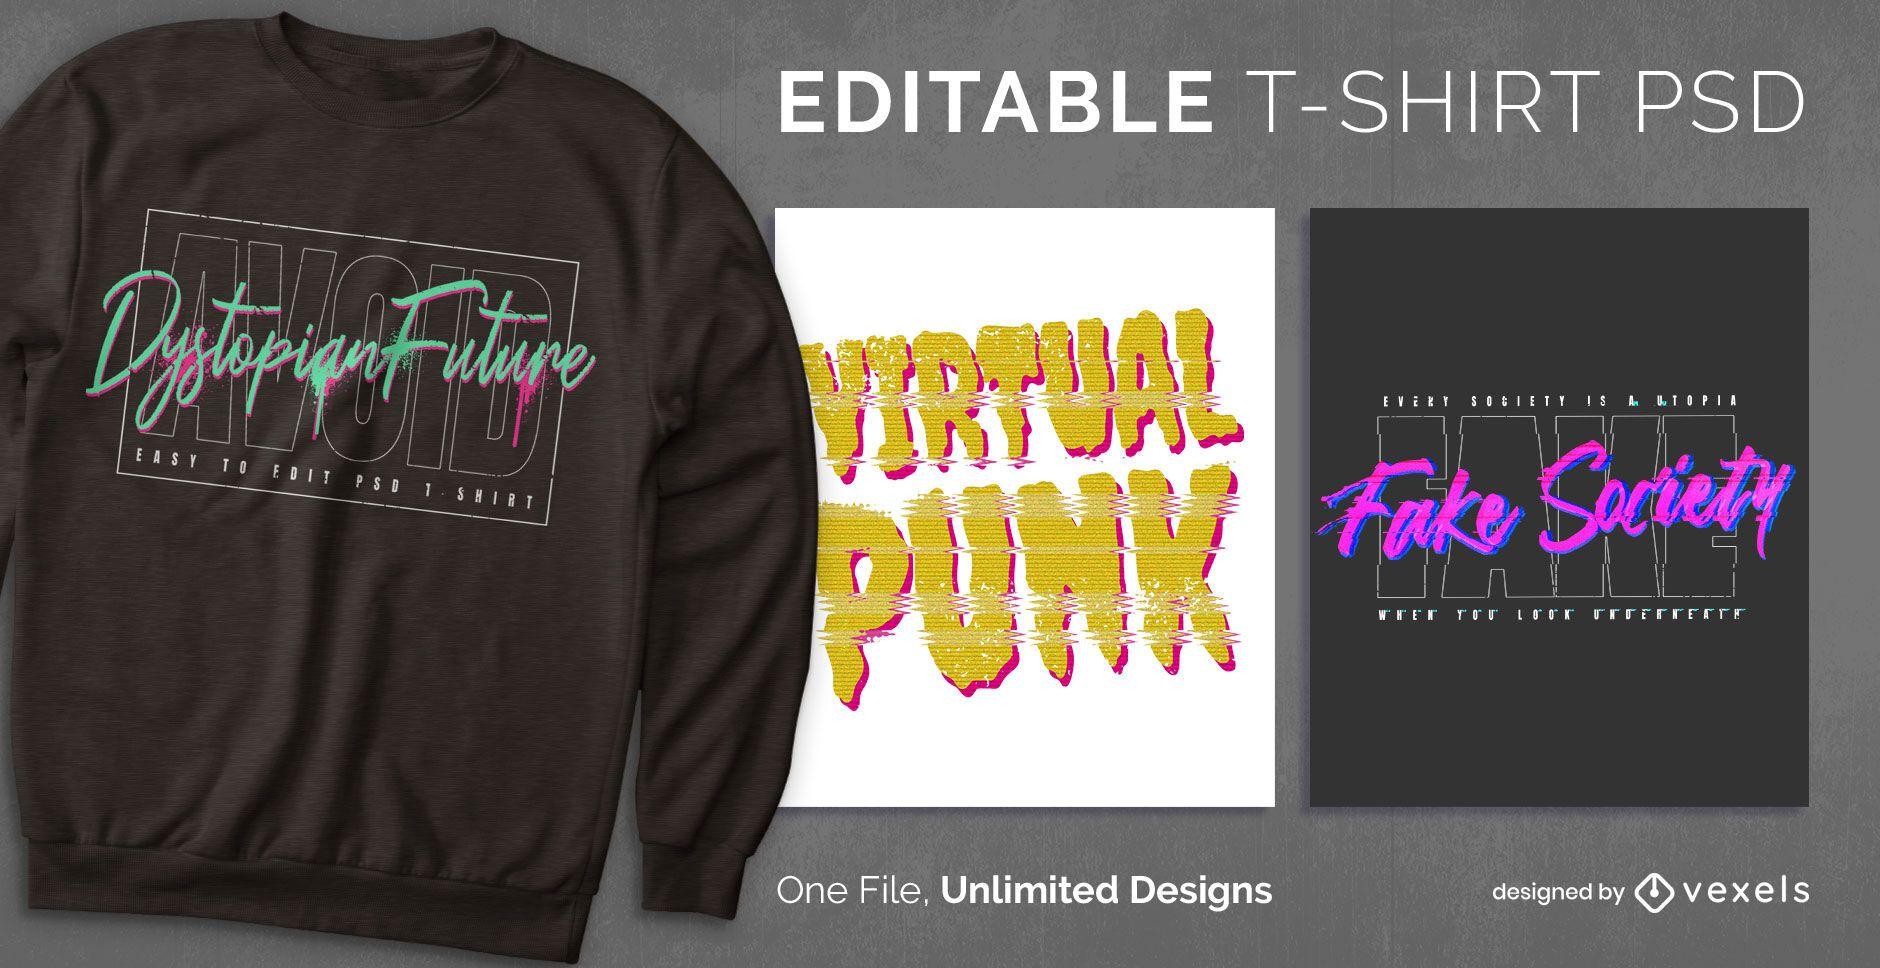 Camiseta cyberpunk escalable psd